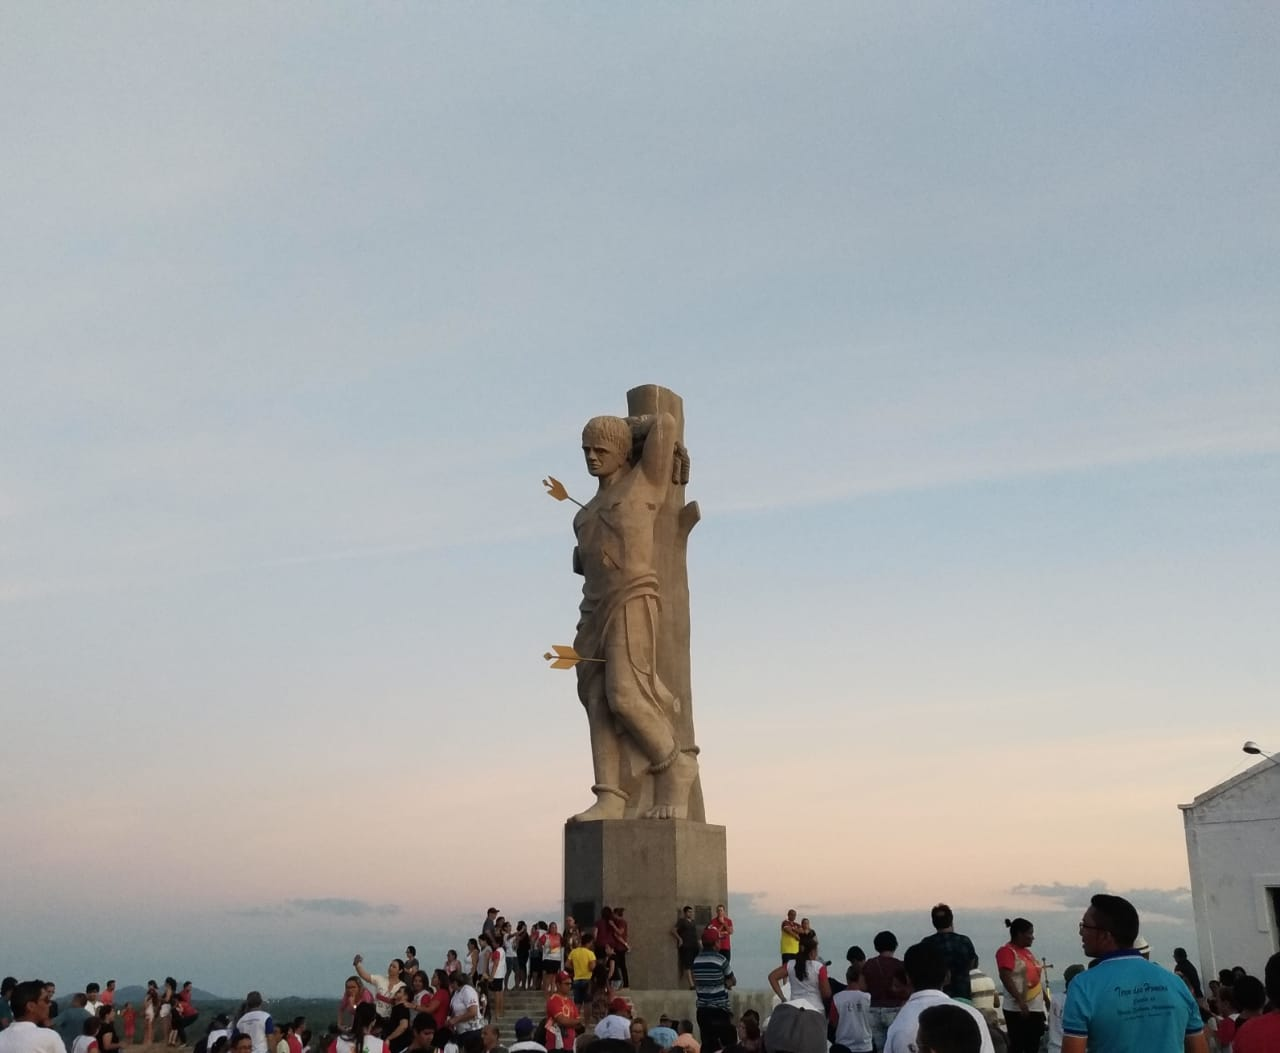 Ipaumirim Ceará fonte: upload.wikimedia.org